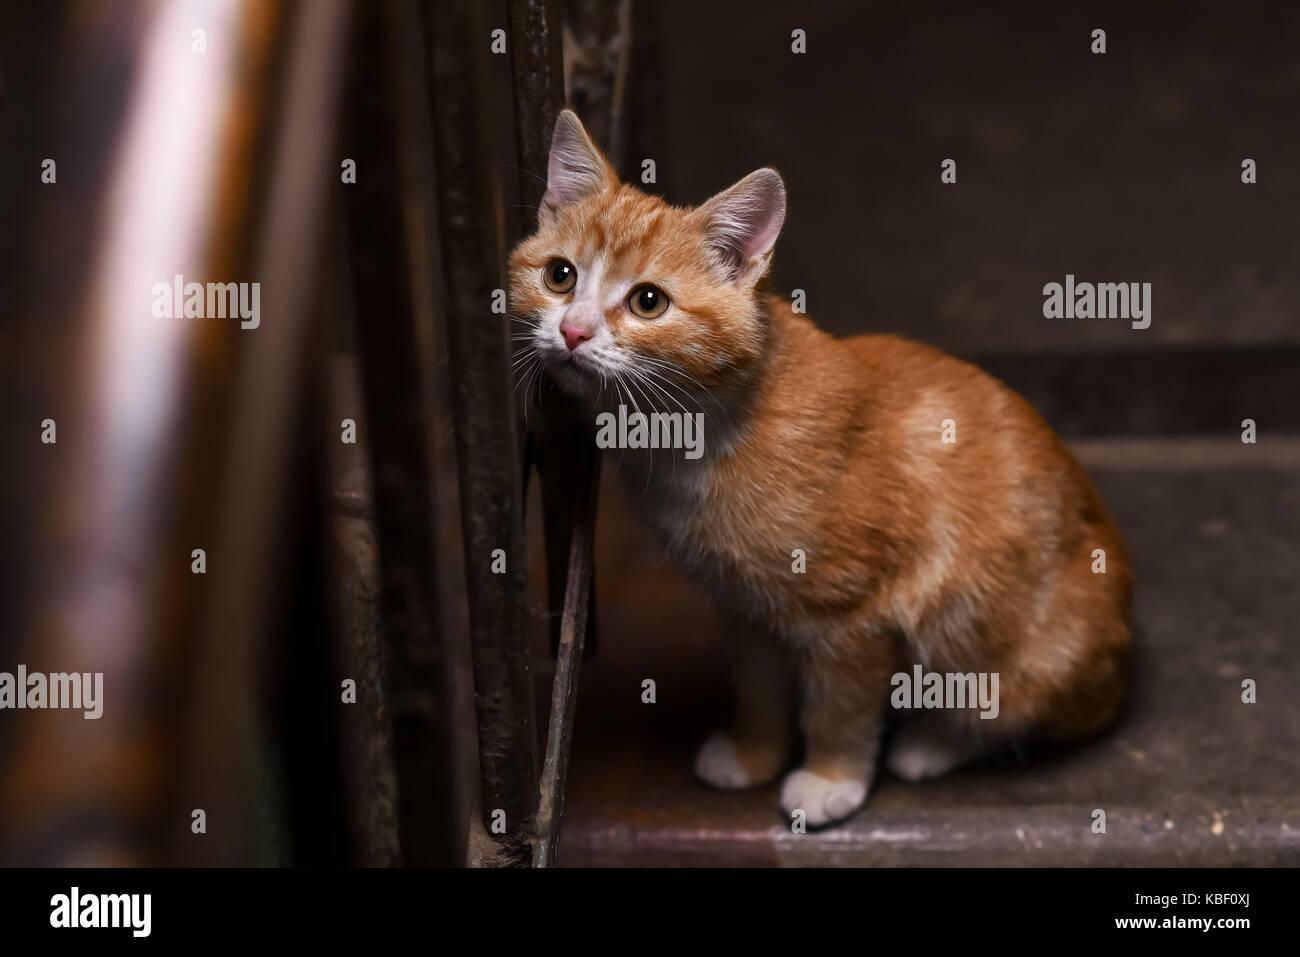 cat ladder stock photos u0026 cat ladder stock images alamy